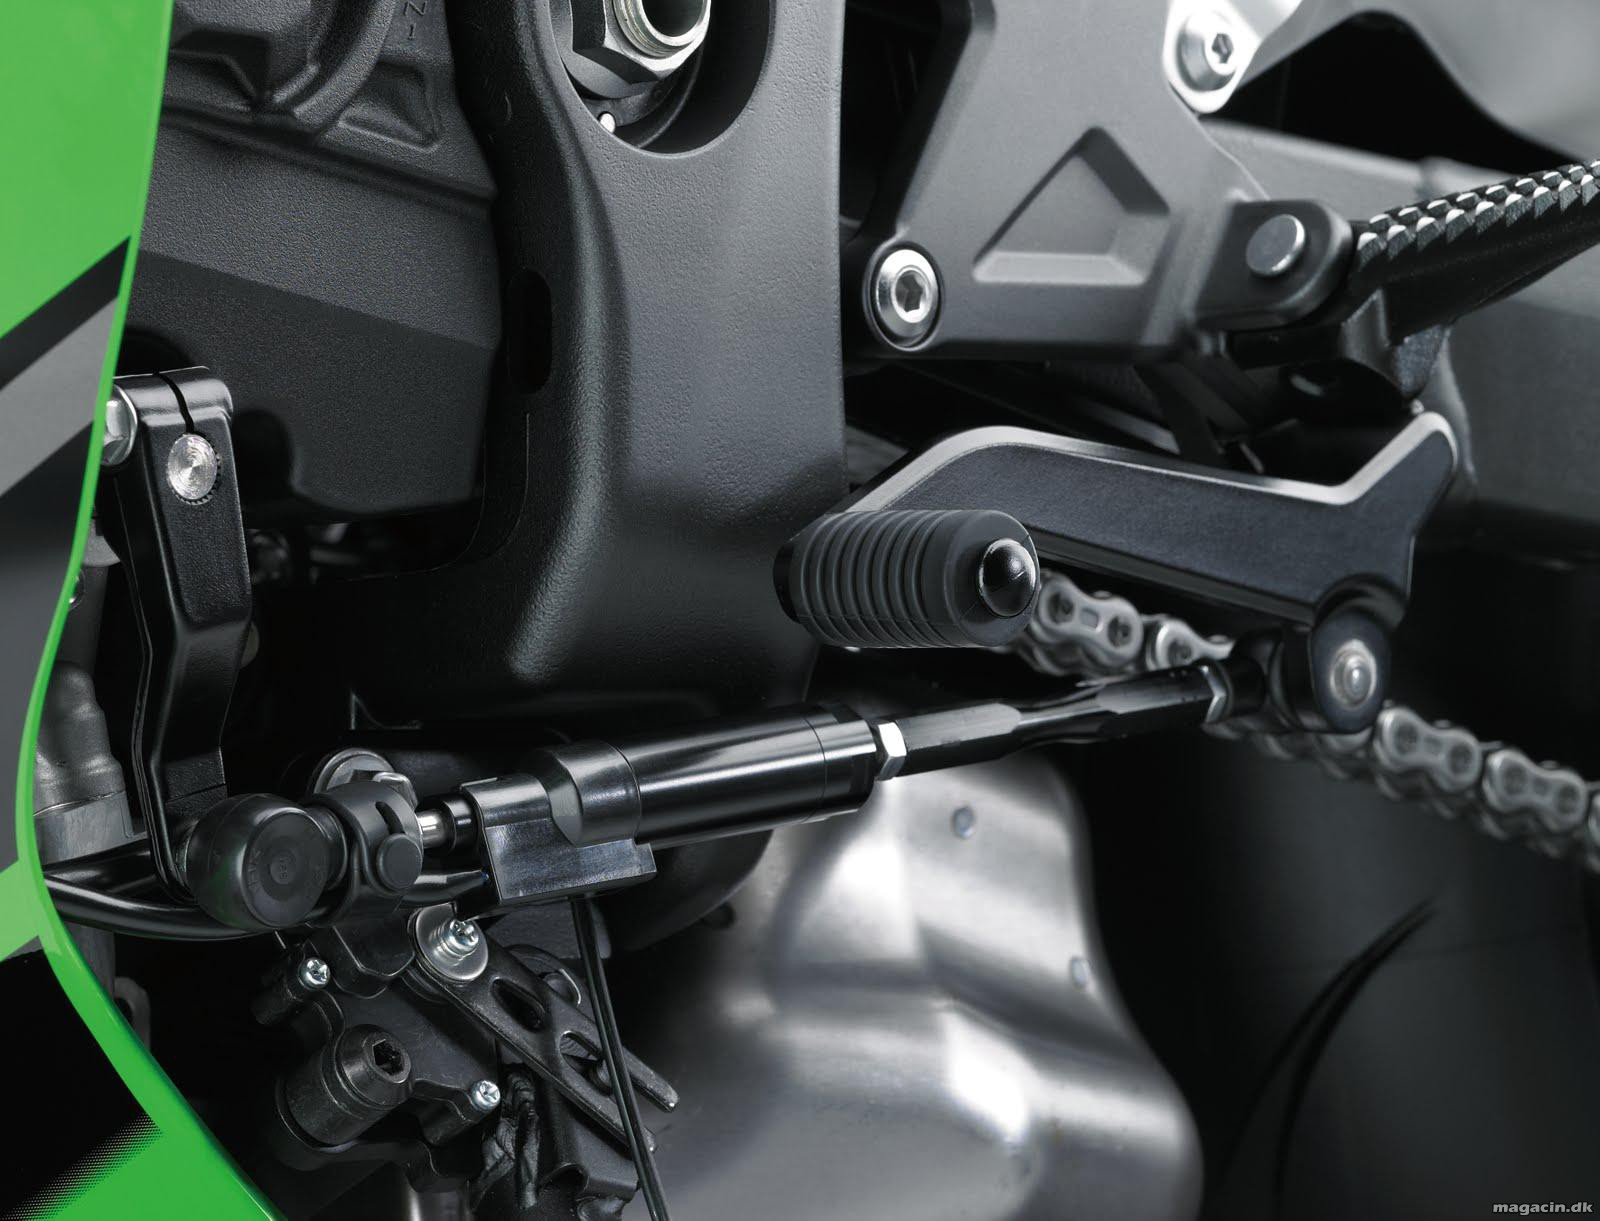 Kawasaki Zx10r Anno 2016 Vilddyret Forbedres Img 2400 6795 58 1444340978